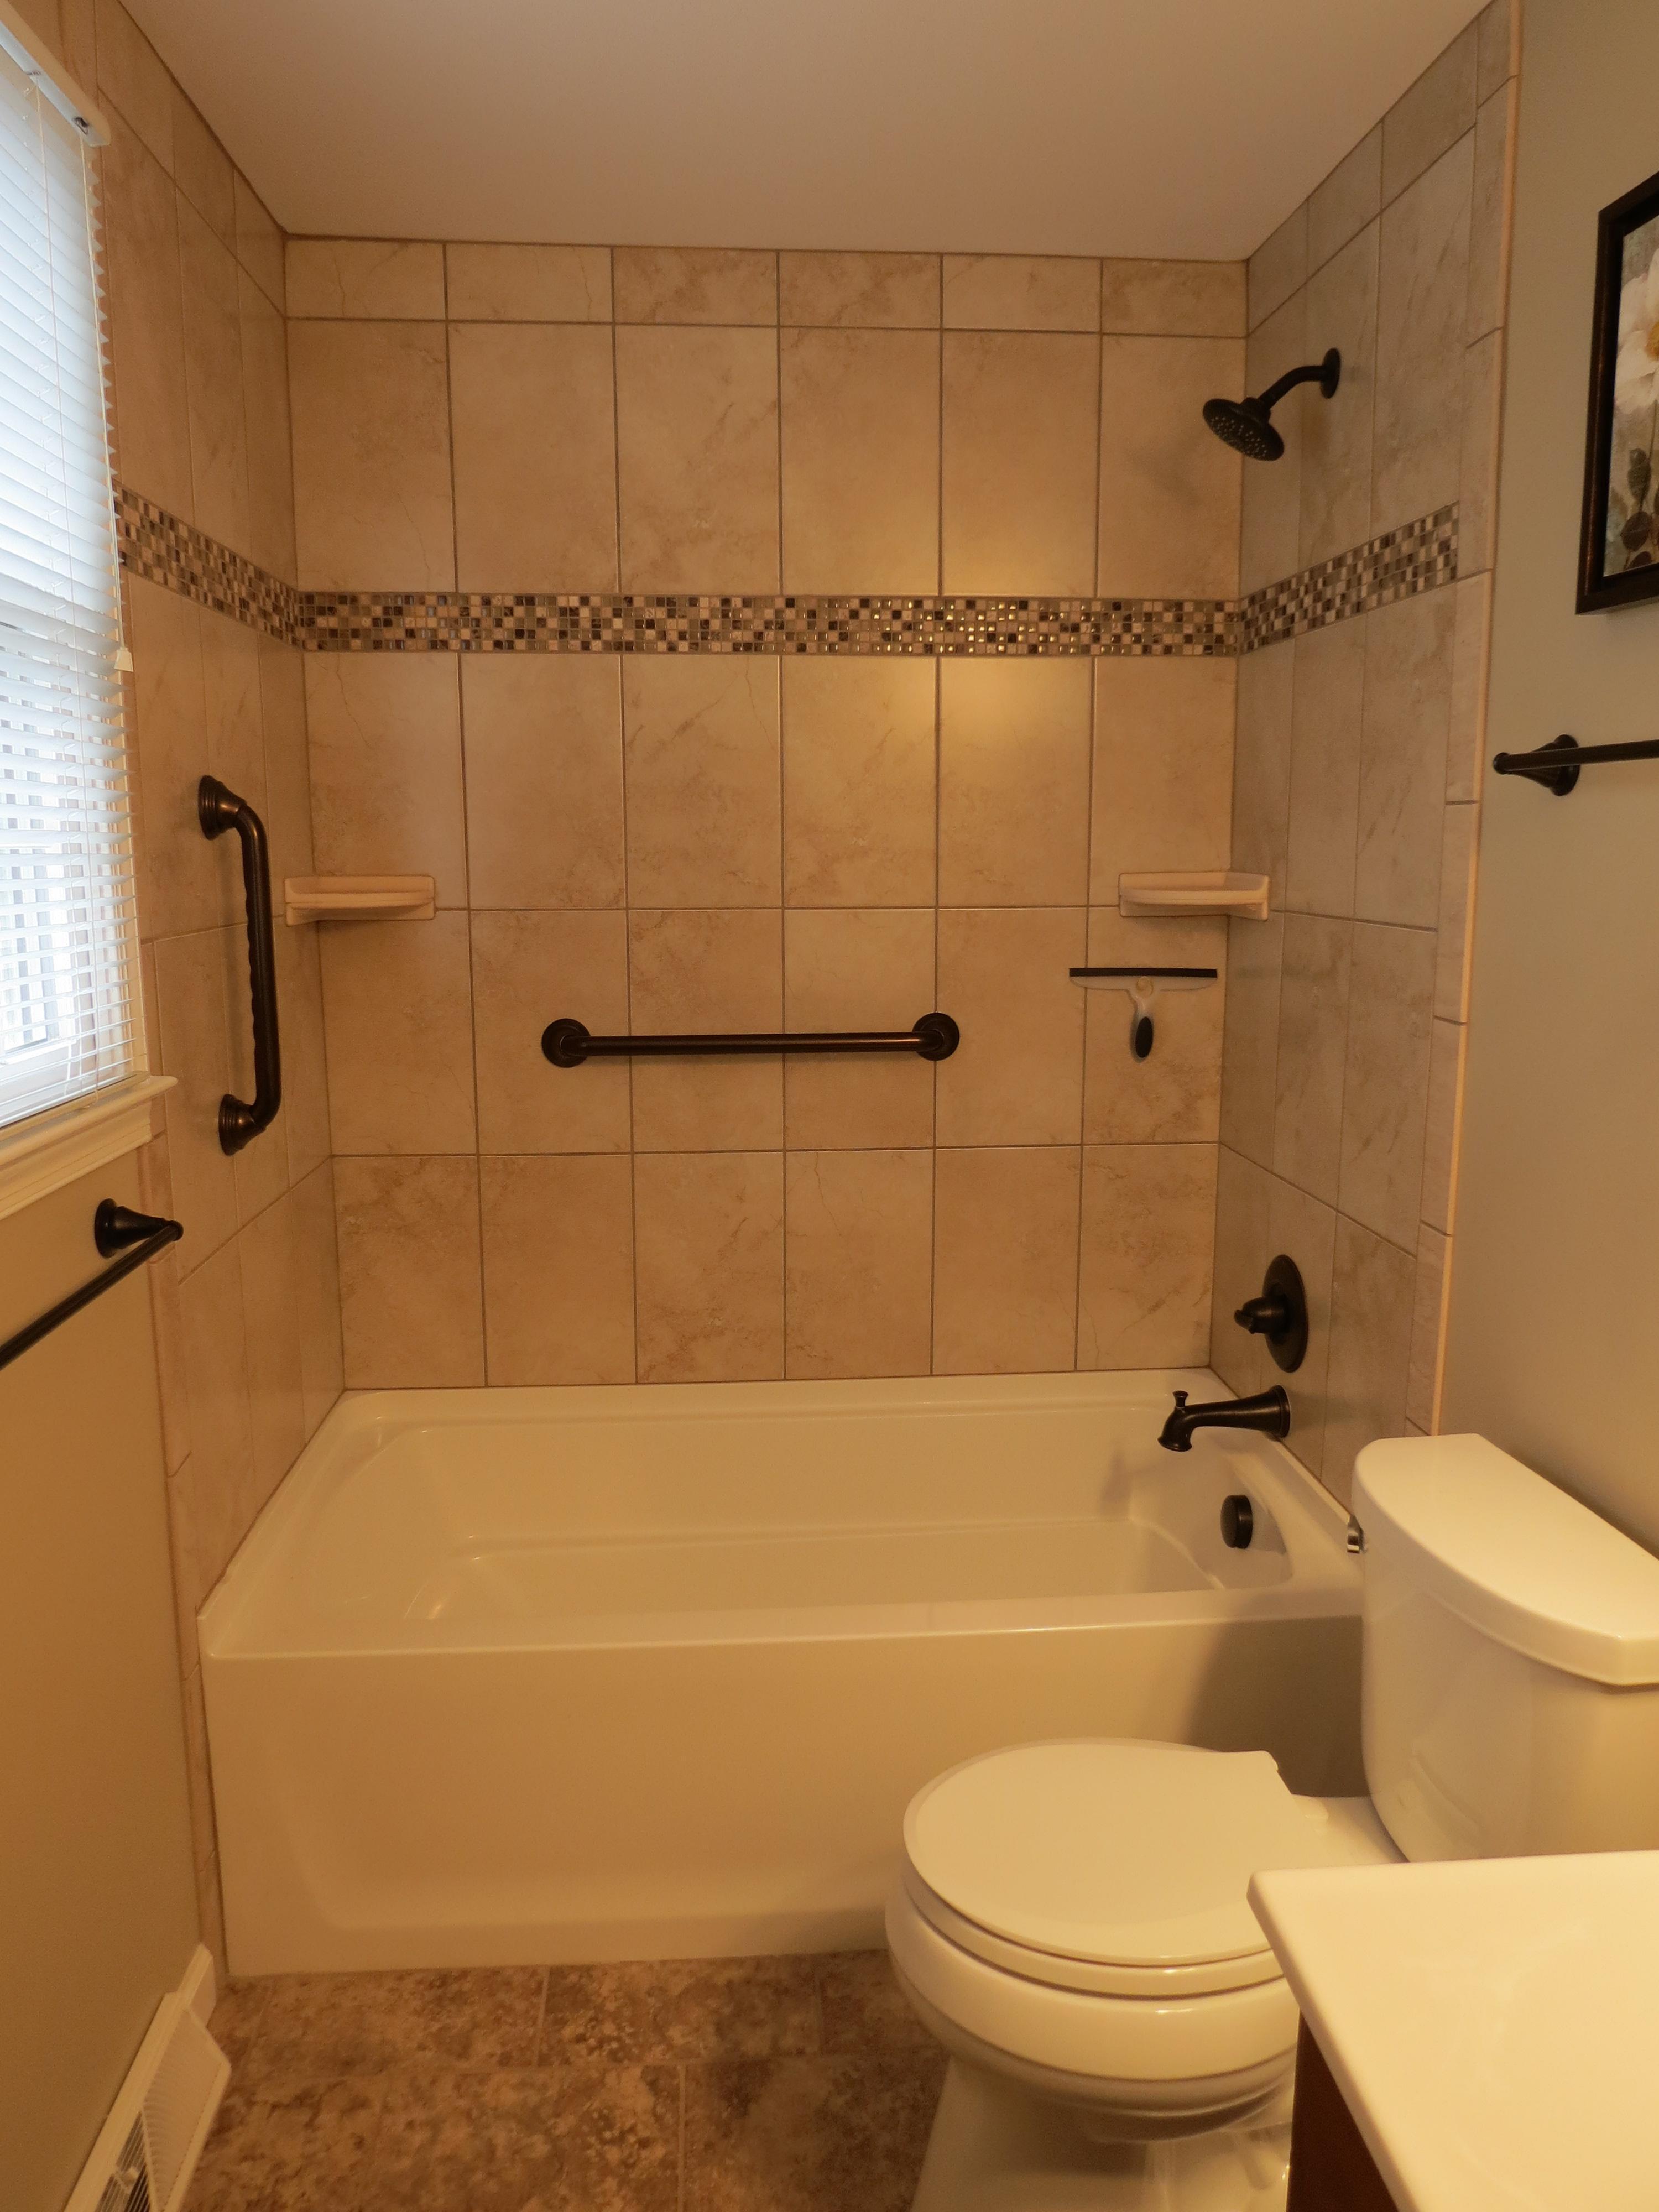 Zimco plumbing in manheim pa 17545 for Bathroom remodel plumbing